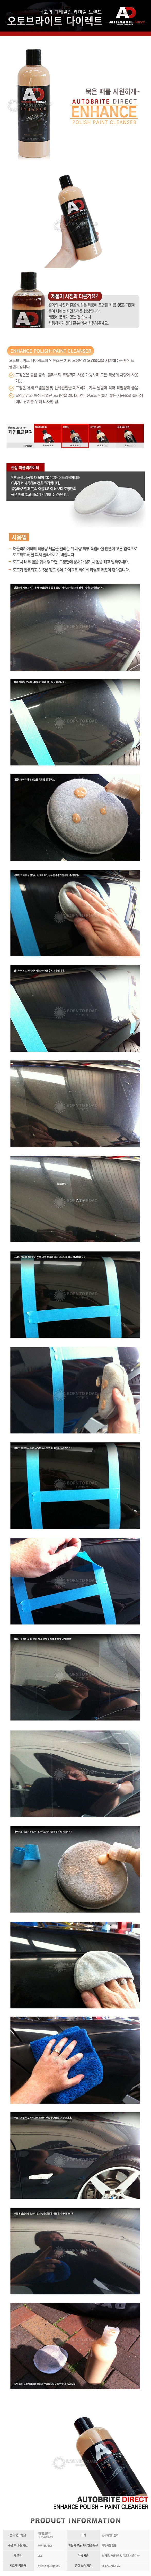 paint_cleanser_enhance_btr.jpg